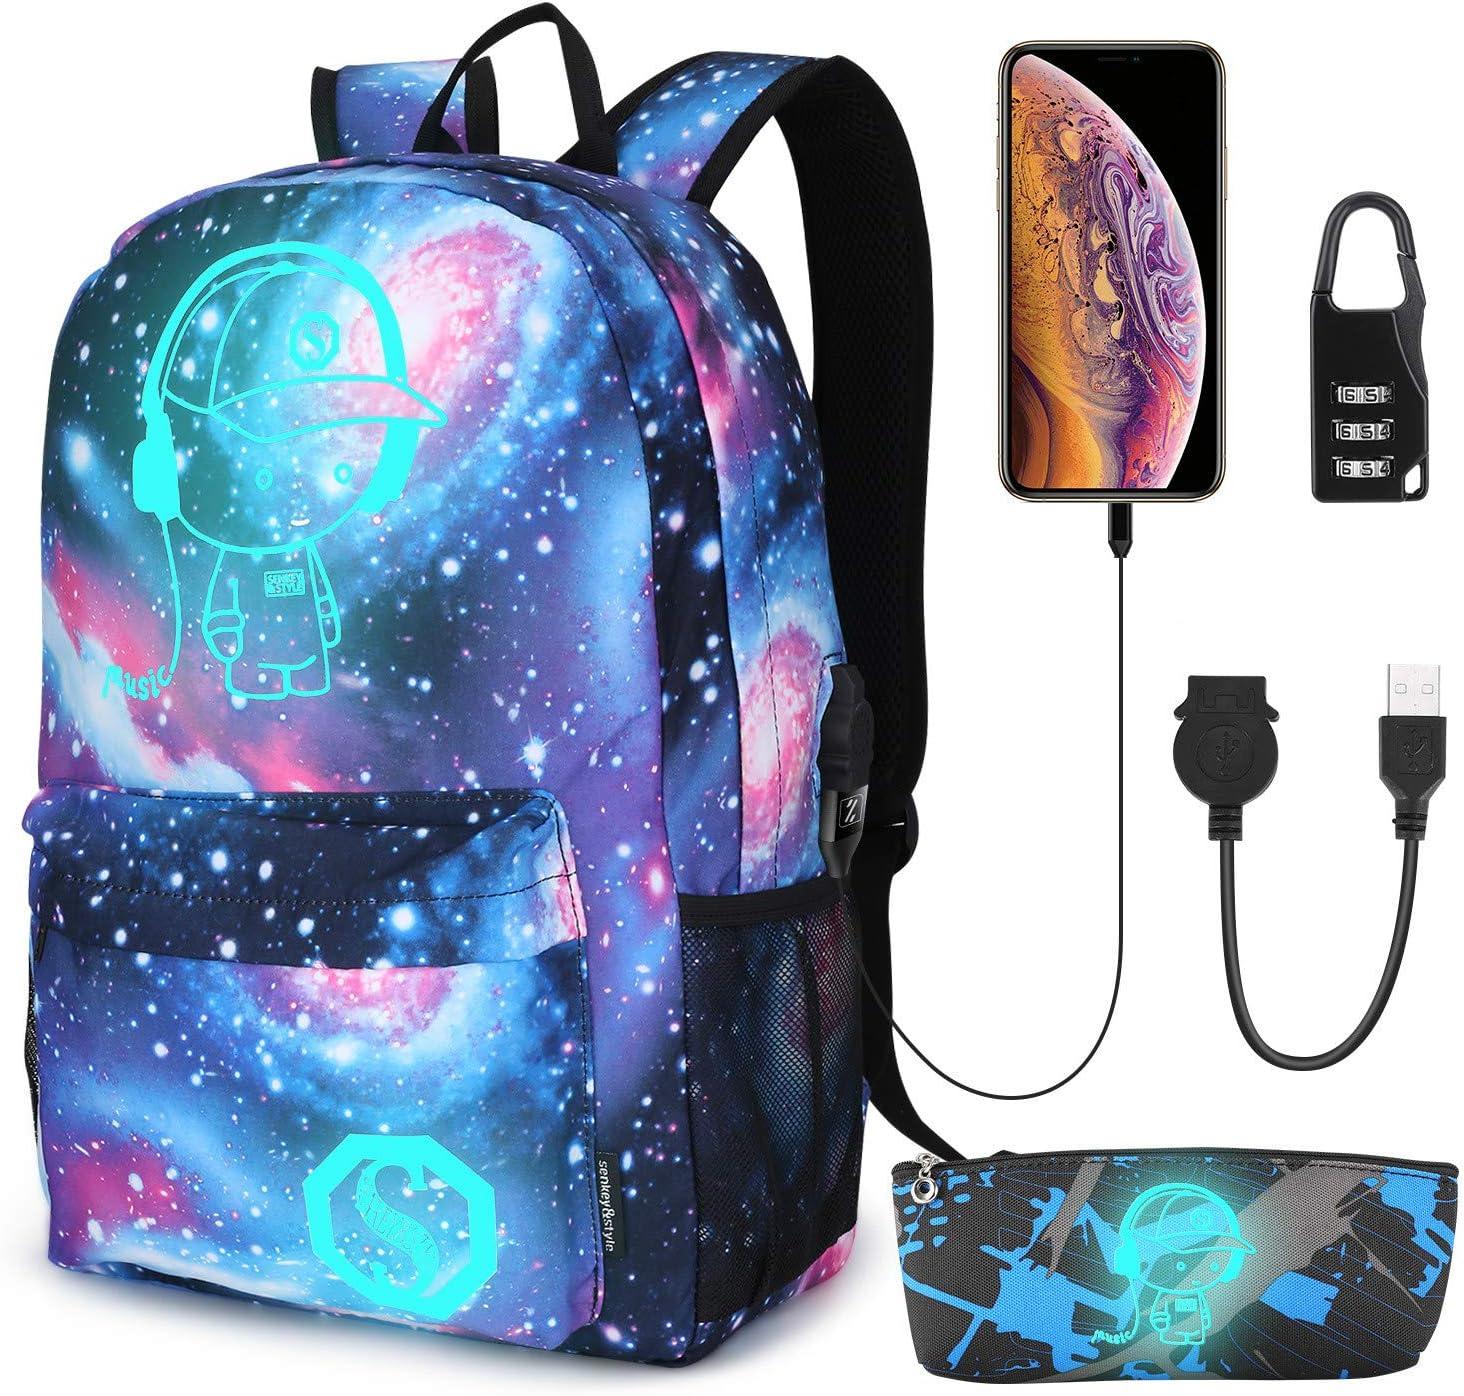 Student Kids School Backpack Book Bag Teenagers Night Luminous Galaxy Printed